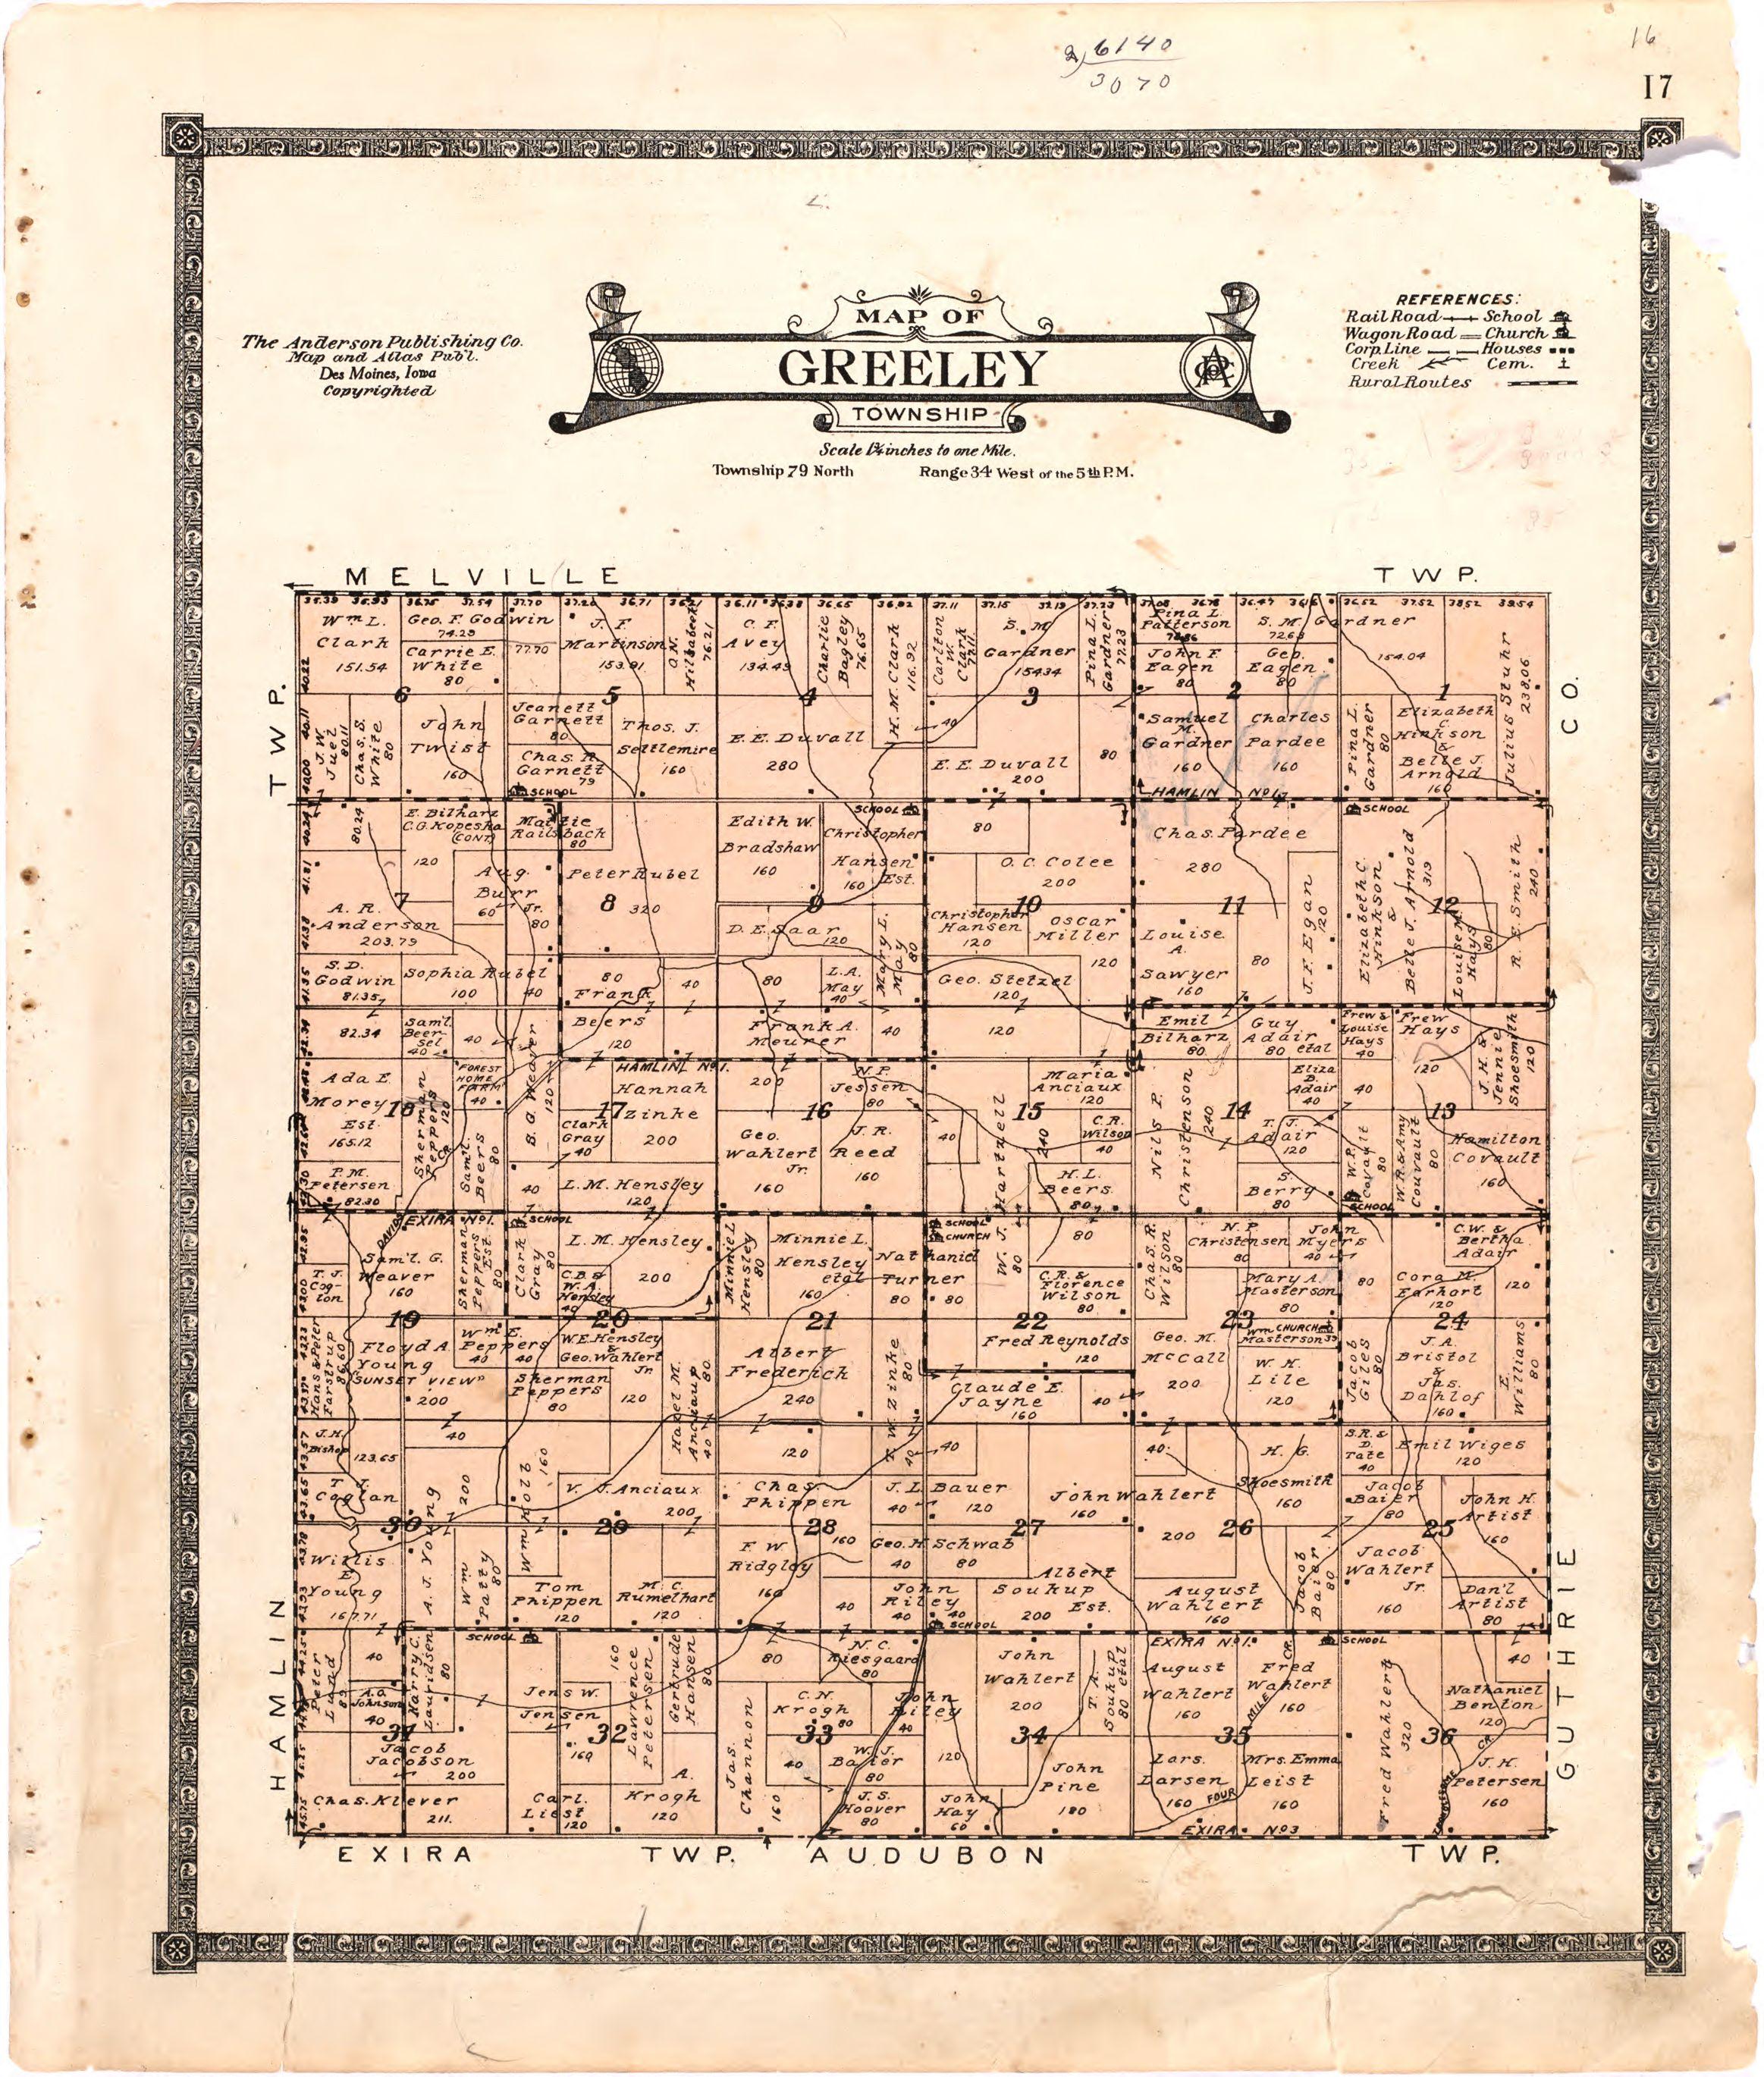 1921 Farm Map of Greeley Township, Audubon County, Iowa